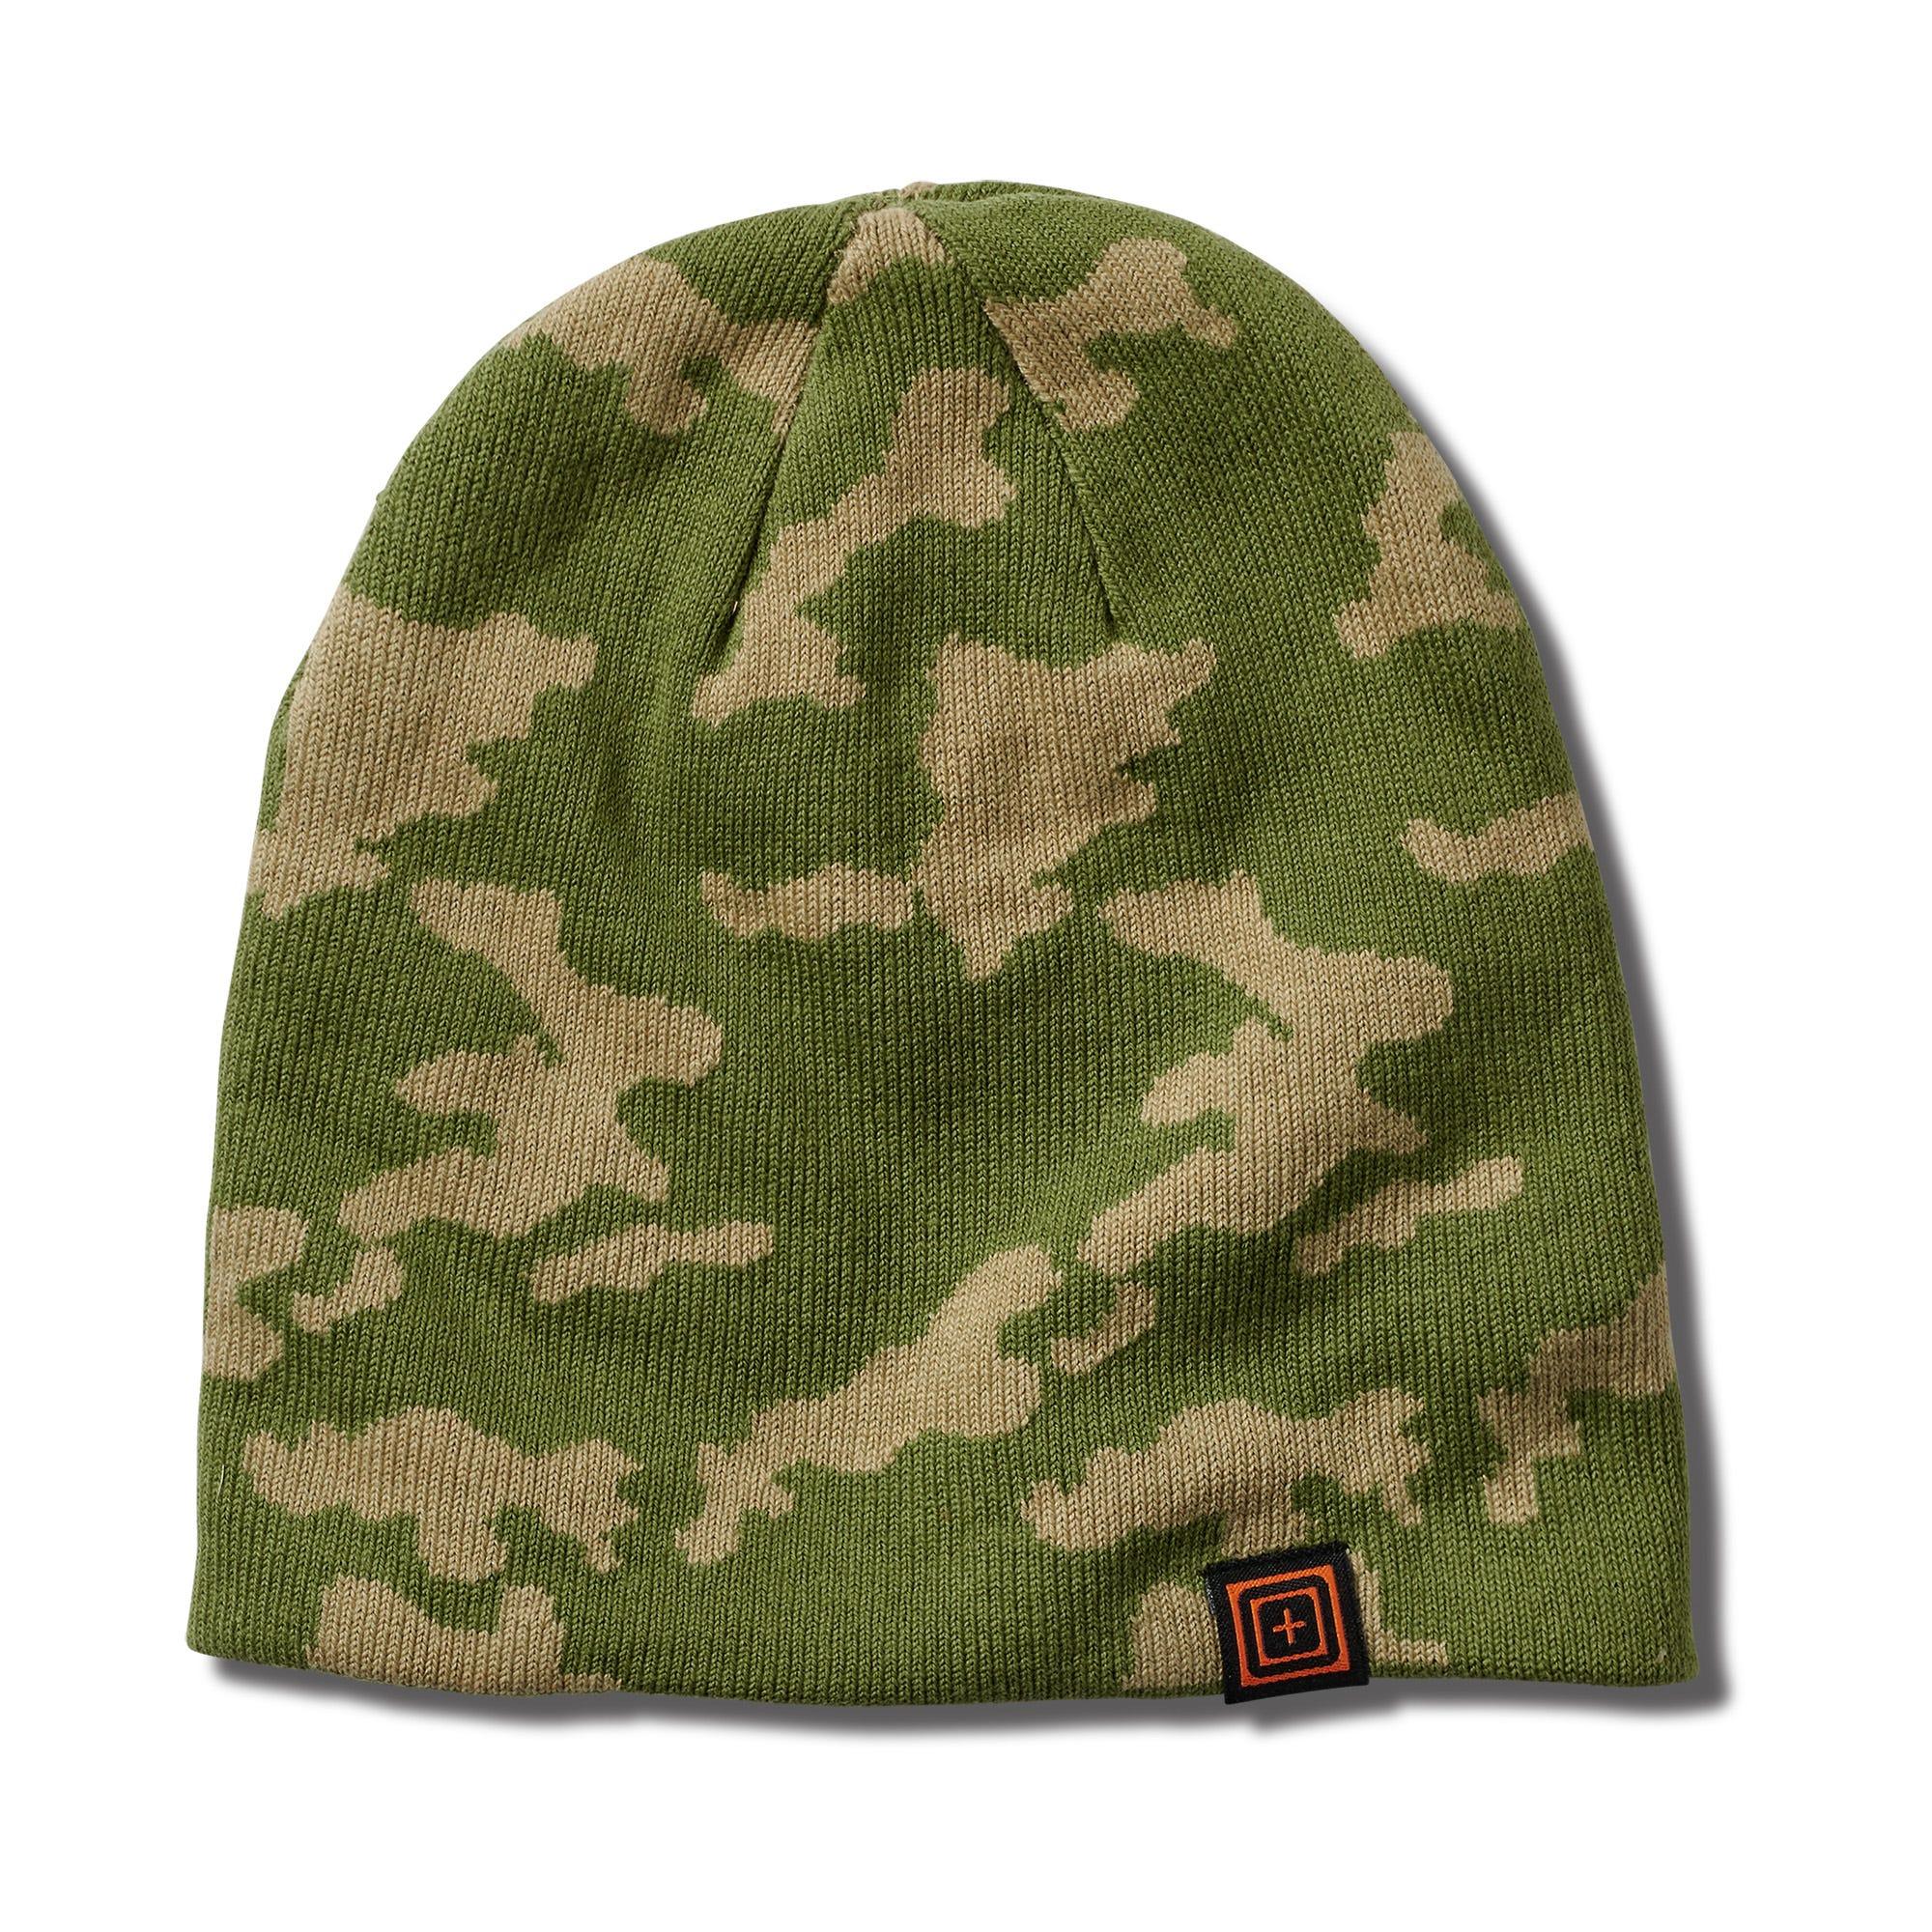 5.11 Tactical Men's Jacquard Beanie